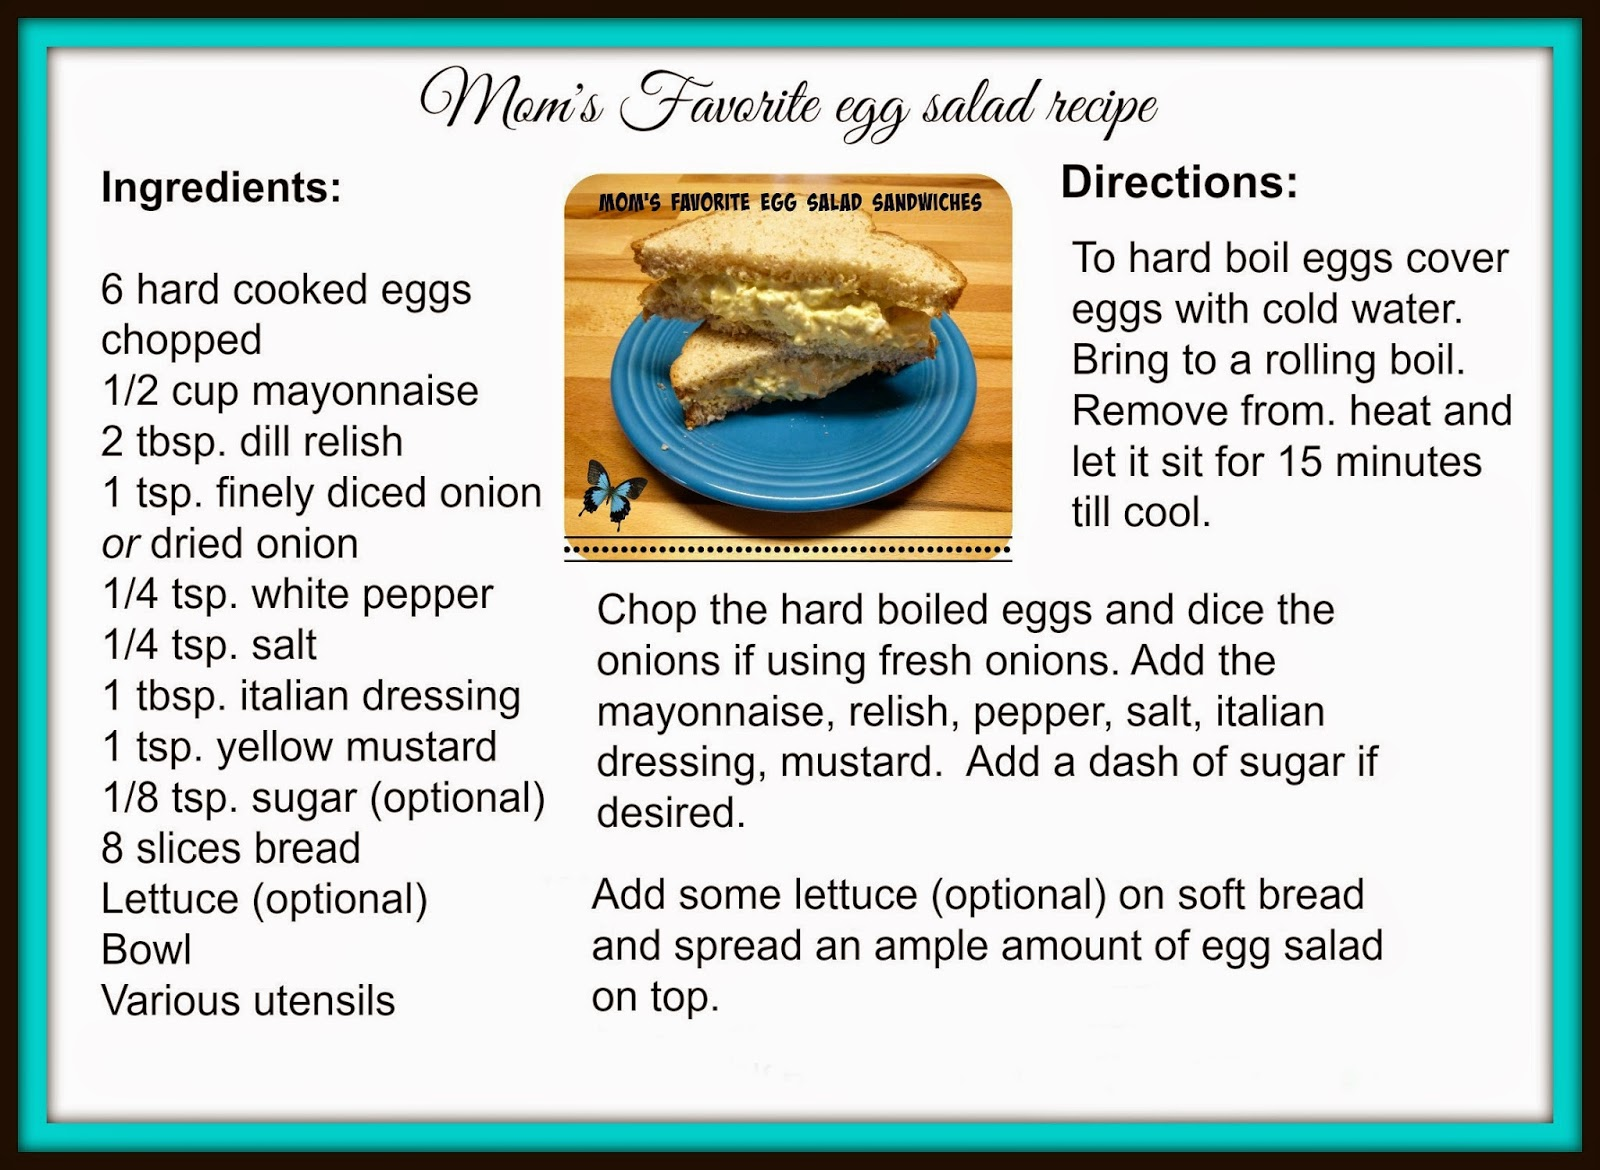 Egg salad recipe card